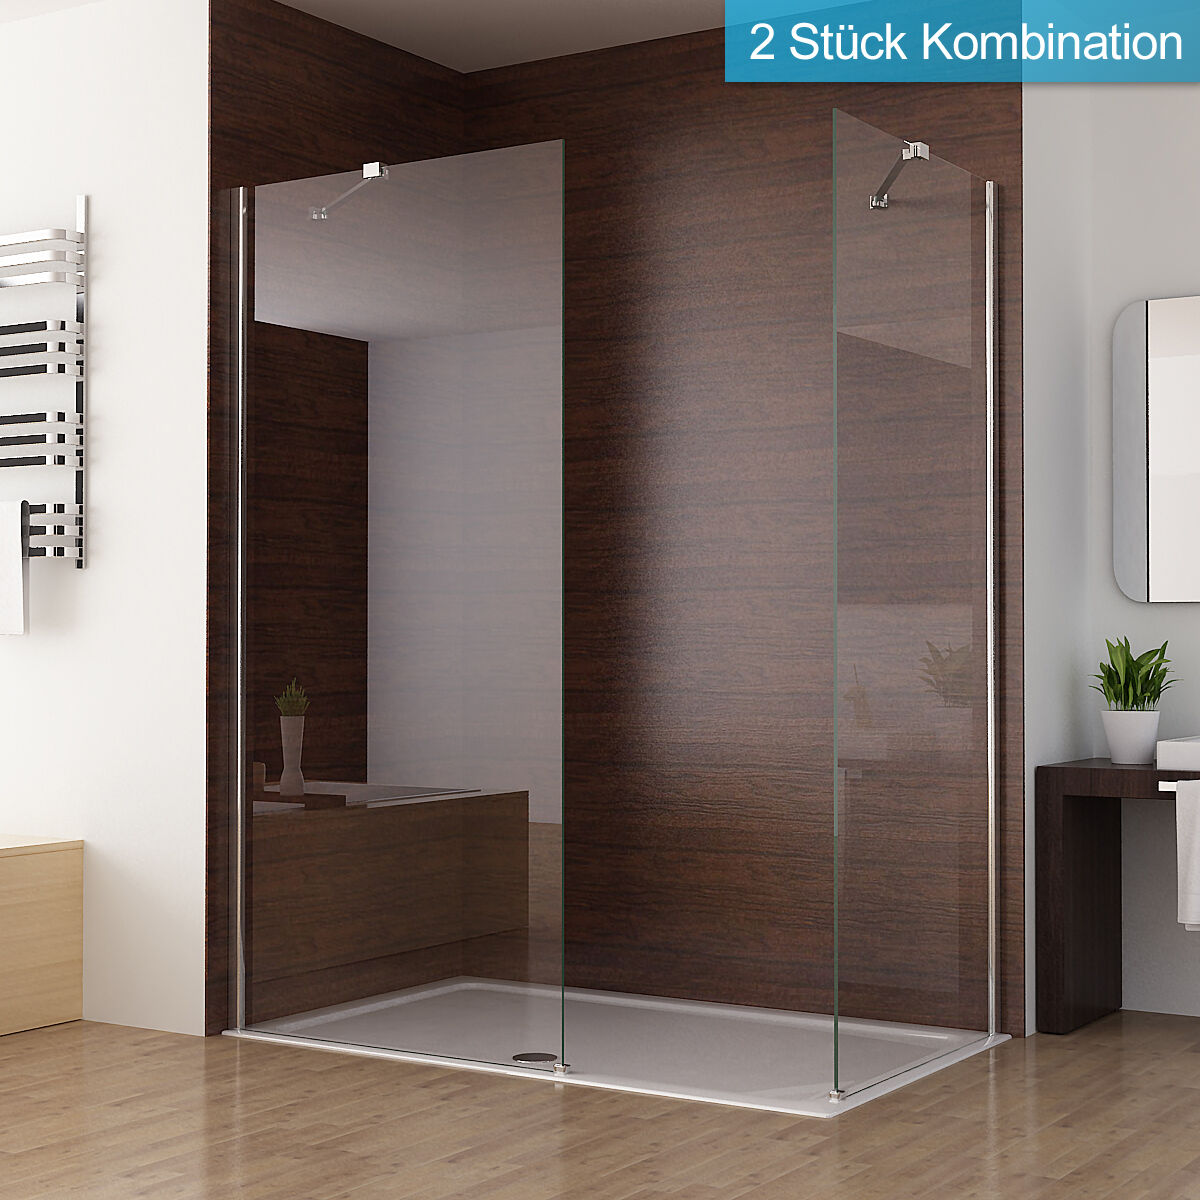 duschabtrennung walk in duschwand seitenwand dusche duschtrennwand 70 90 x 195cm ebay. Black Bedroom Furniture Sets. Home Design Ideas